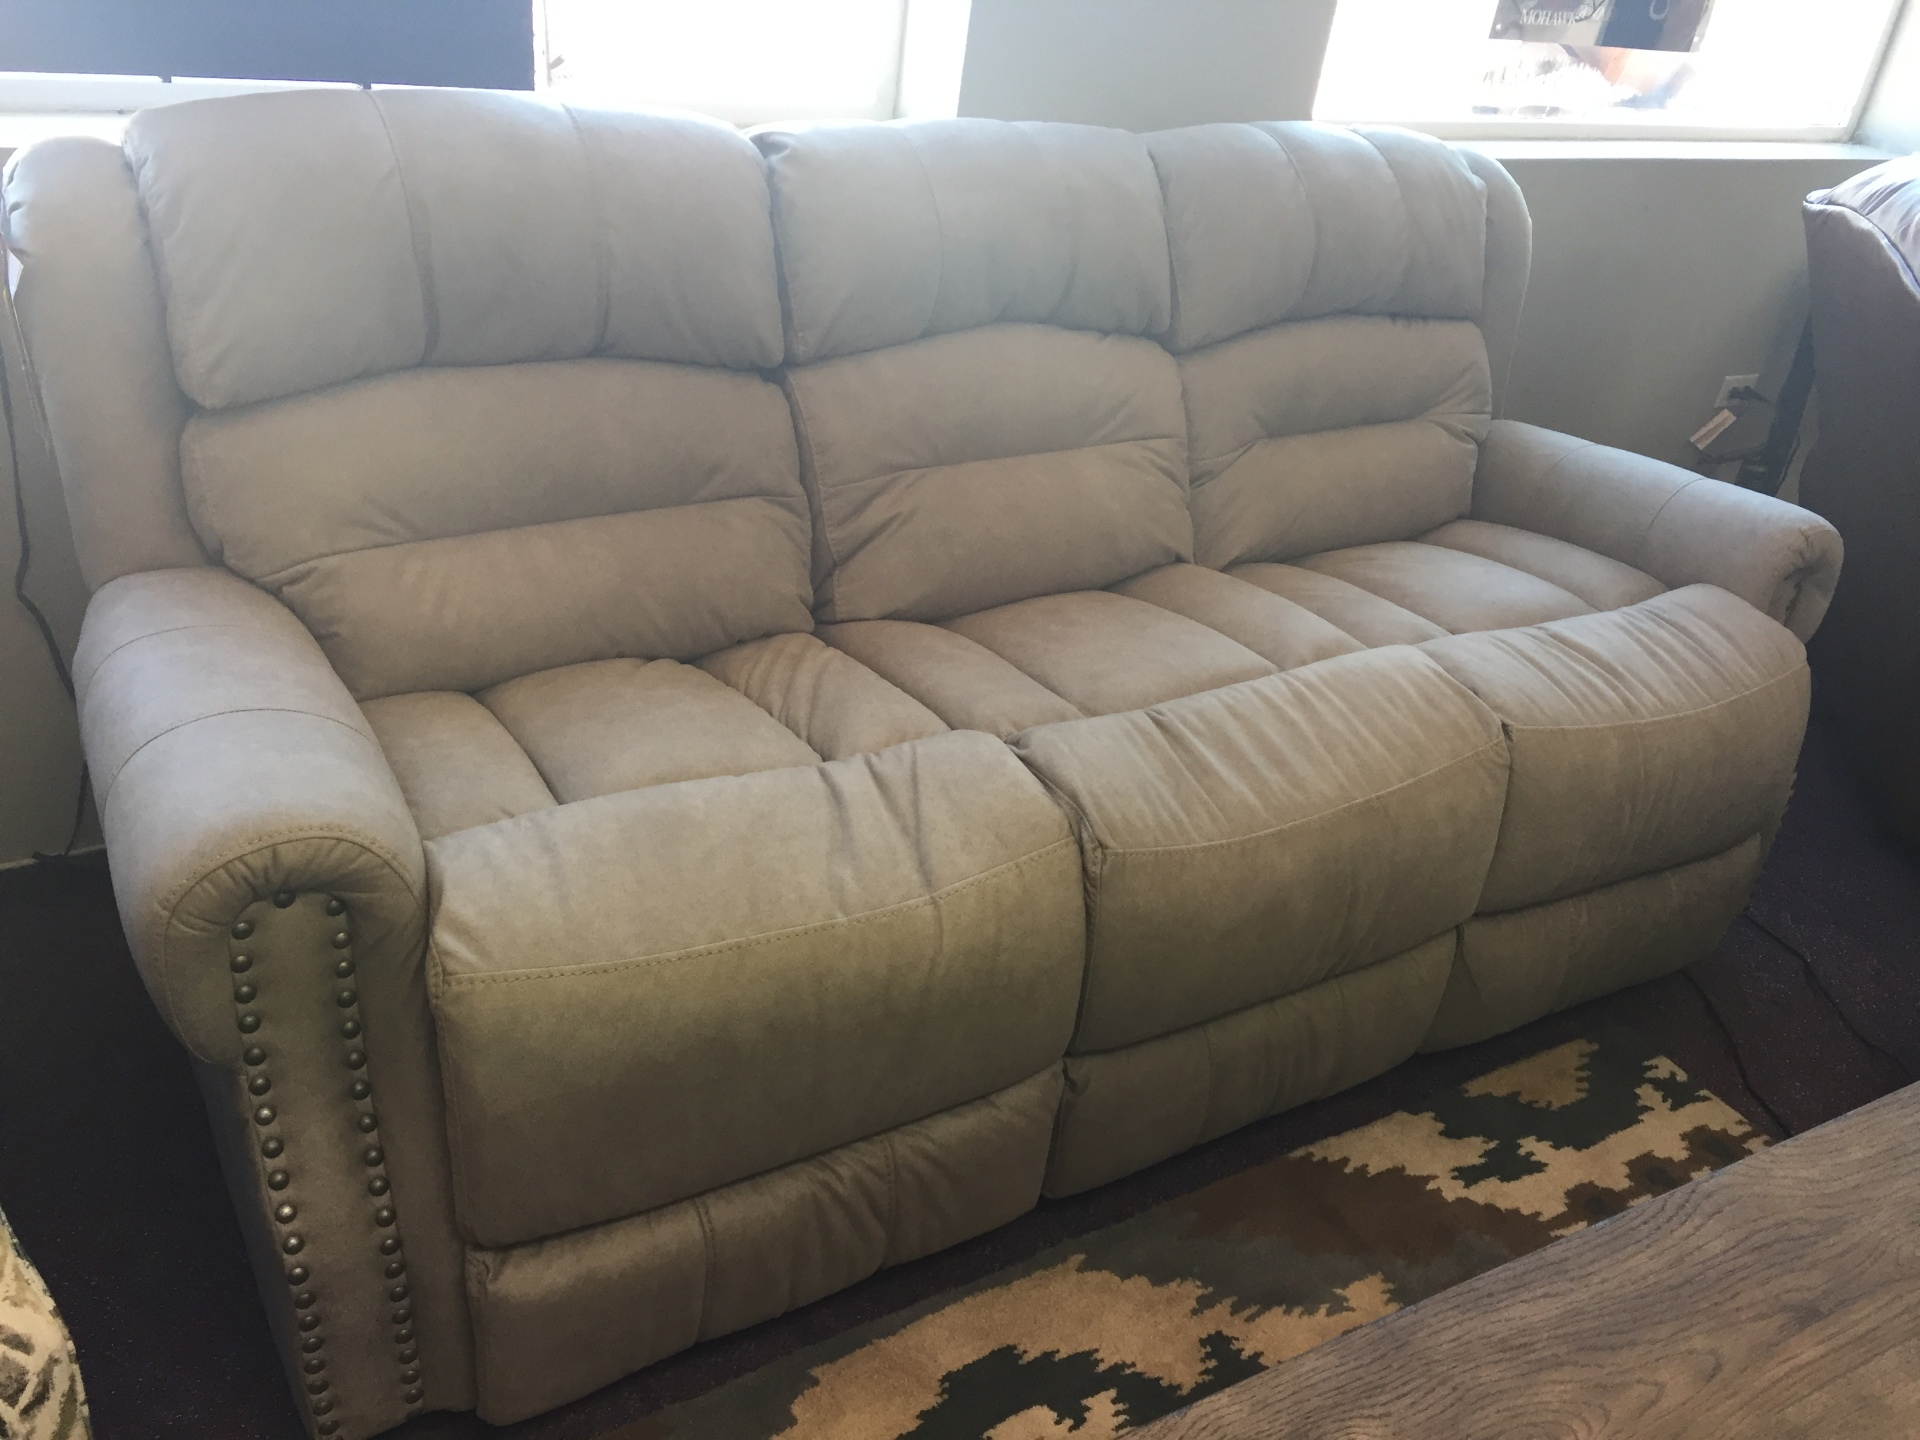 Lane Power Double Reclining Sofa- $1749.950 SALE PRICE $1439.00